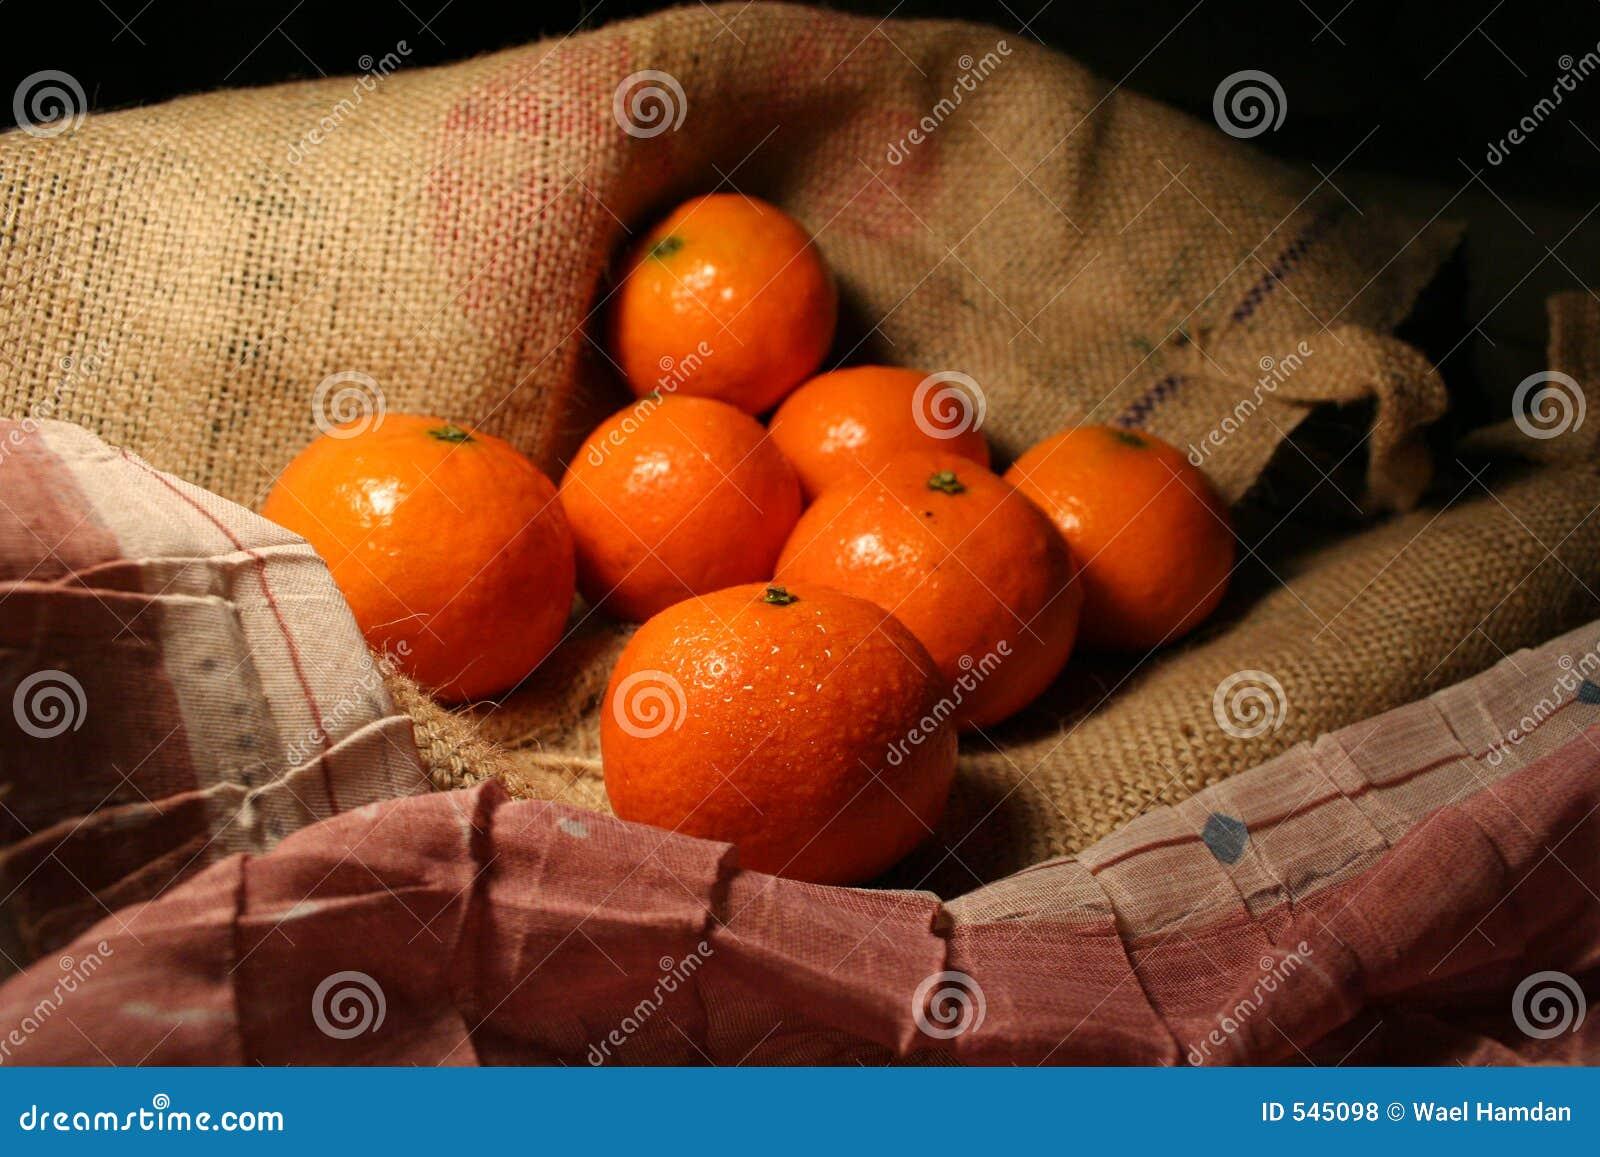 Download 果子普通话 库存照片. 图片 包括有 新鲜, 布料, 可食用, 流感, 果子, 有机, 成熟, 视图, 背包 - 545098